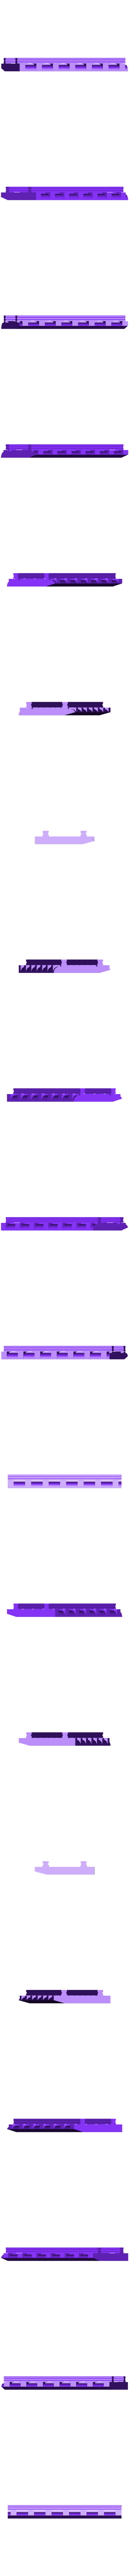 IPAD_SIDE_TRACK_L.stl Download free STL file IPAD STAND (STEAM ENGINE) • 3D printing object, cmtm